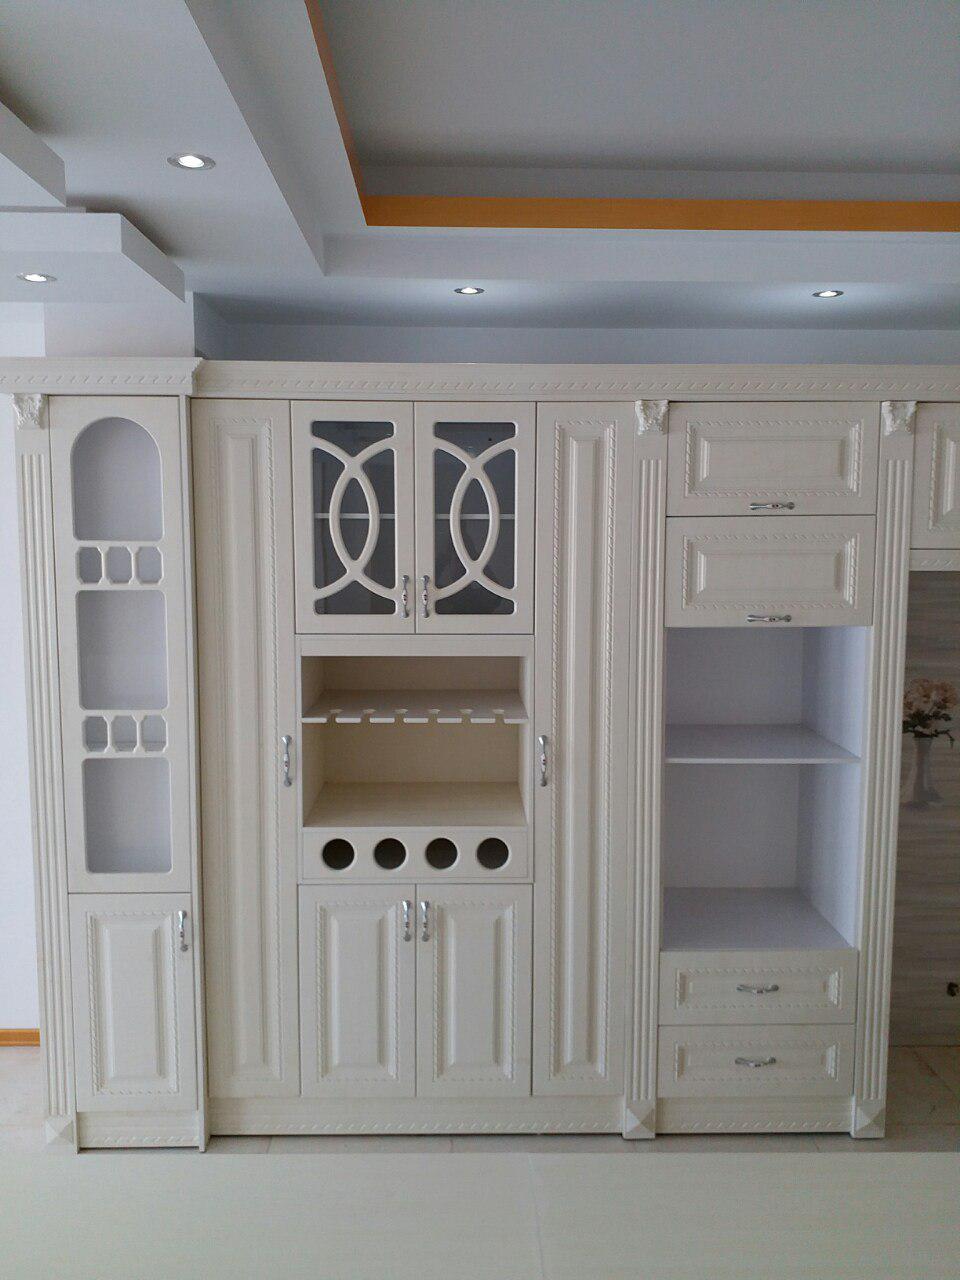 طراحی قفسه کابینت ممبران